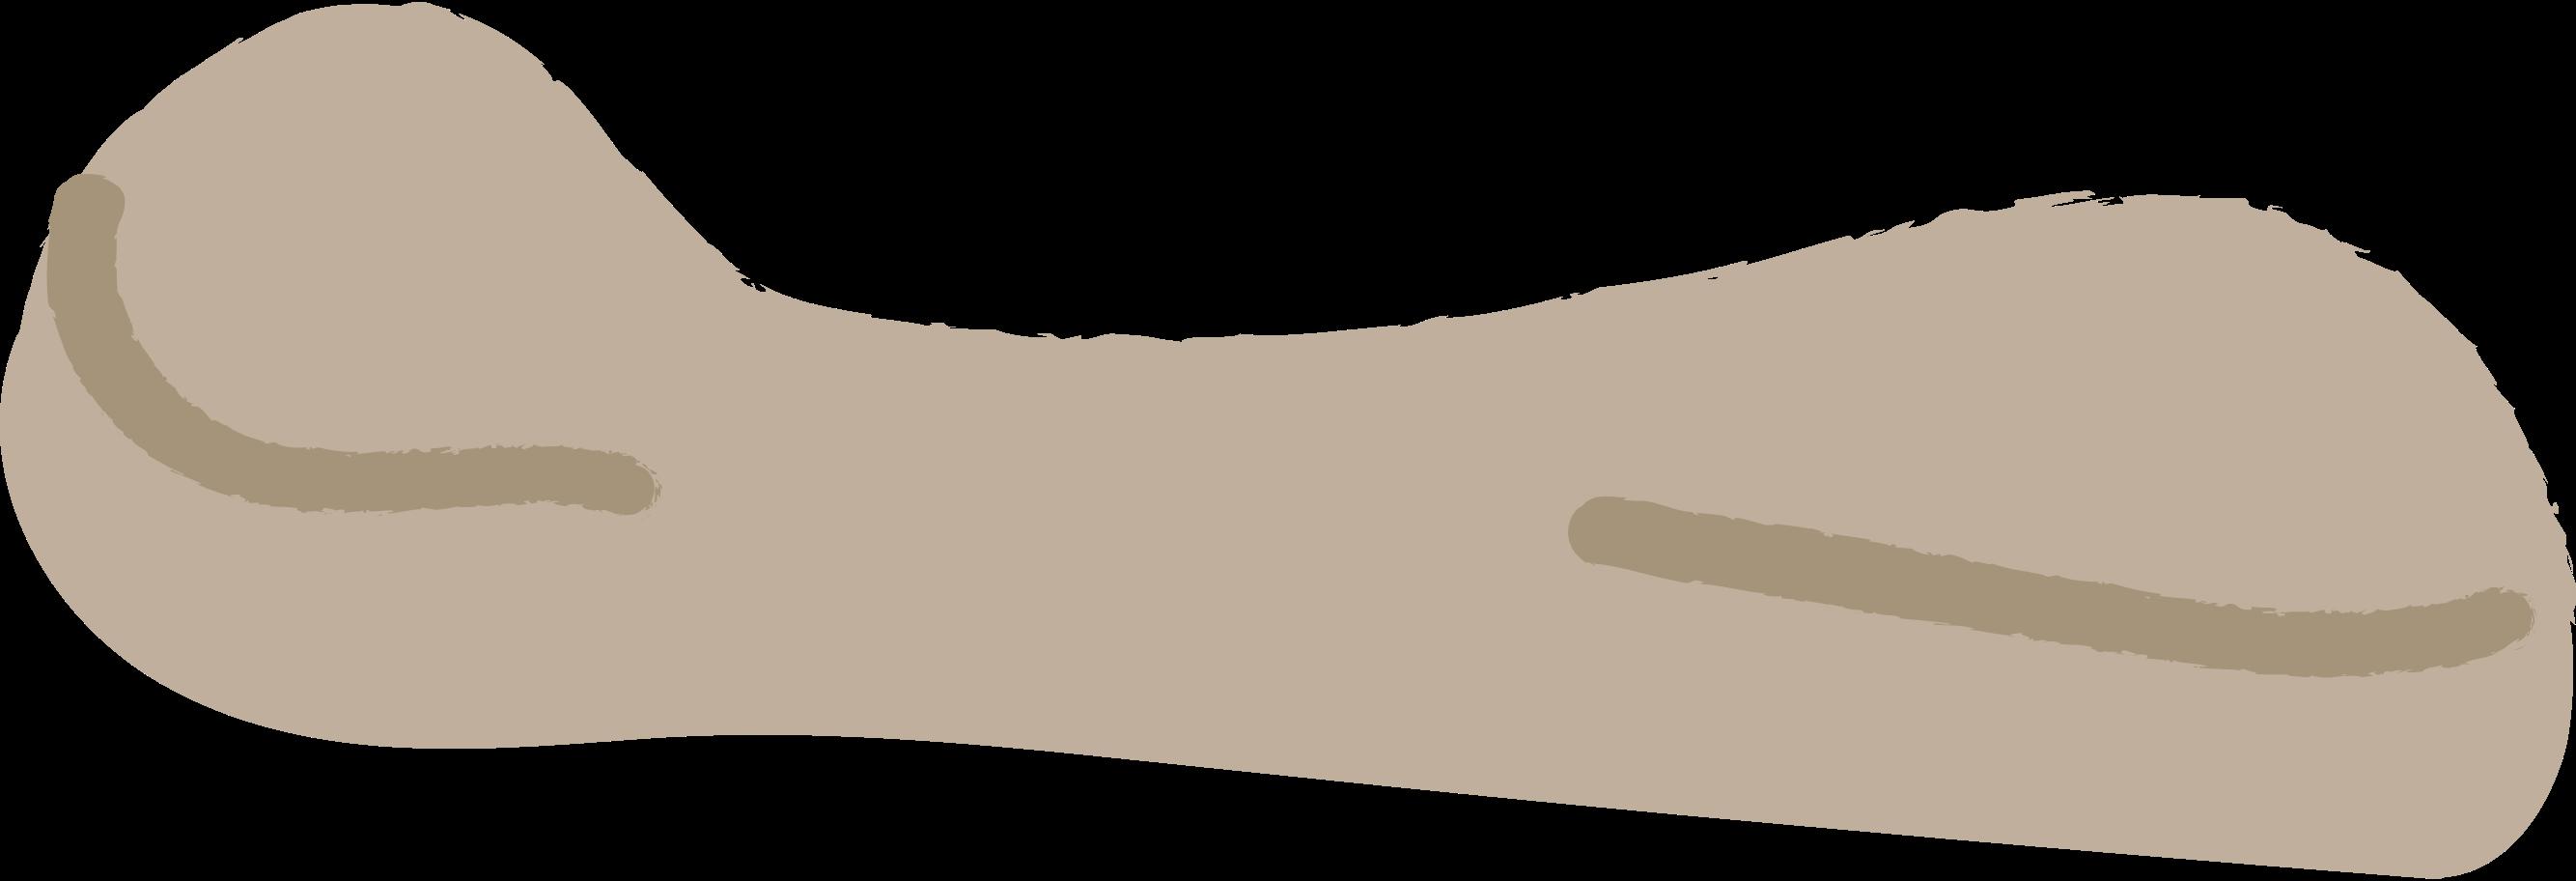 cat bed Clipart illustration in PNG, SVG